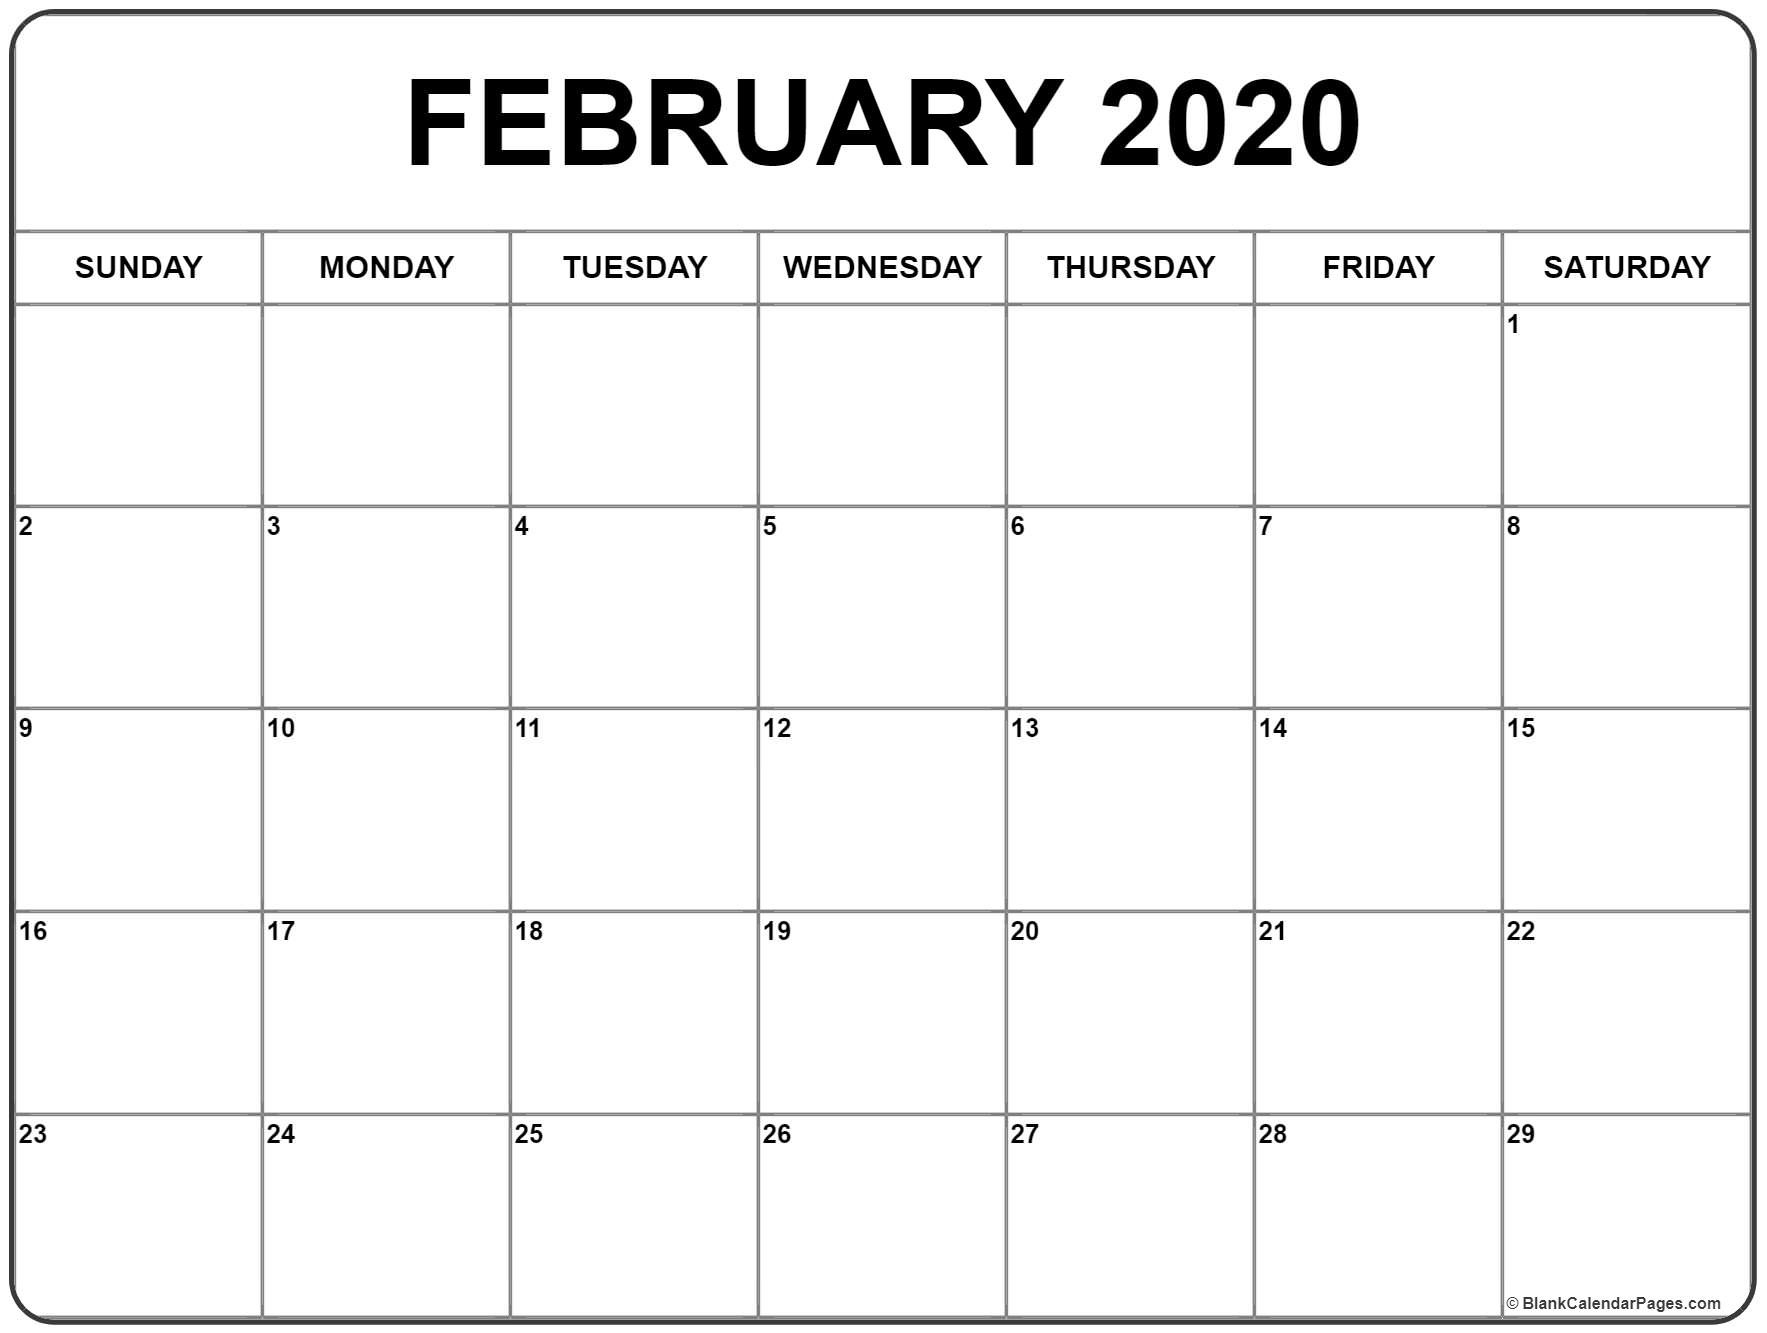 February 2020 Calendar | Free Printable Monthly Calendars-January And February 2020 Calendar